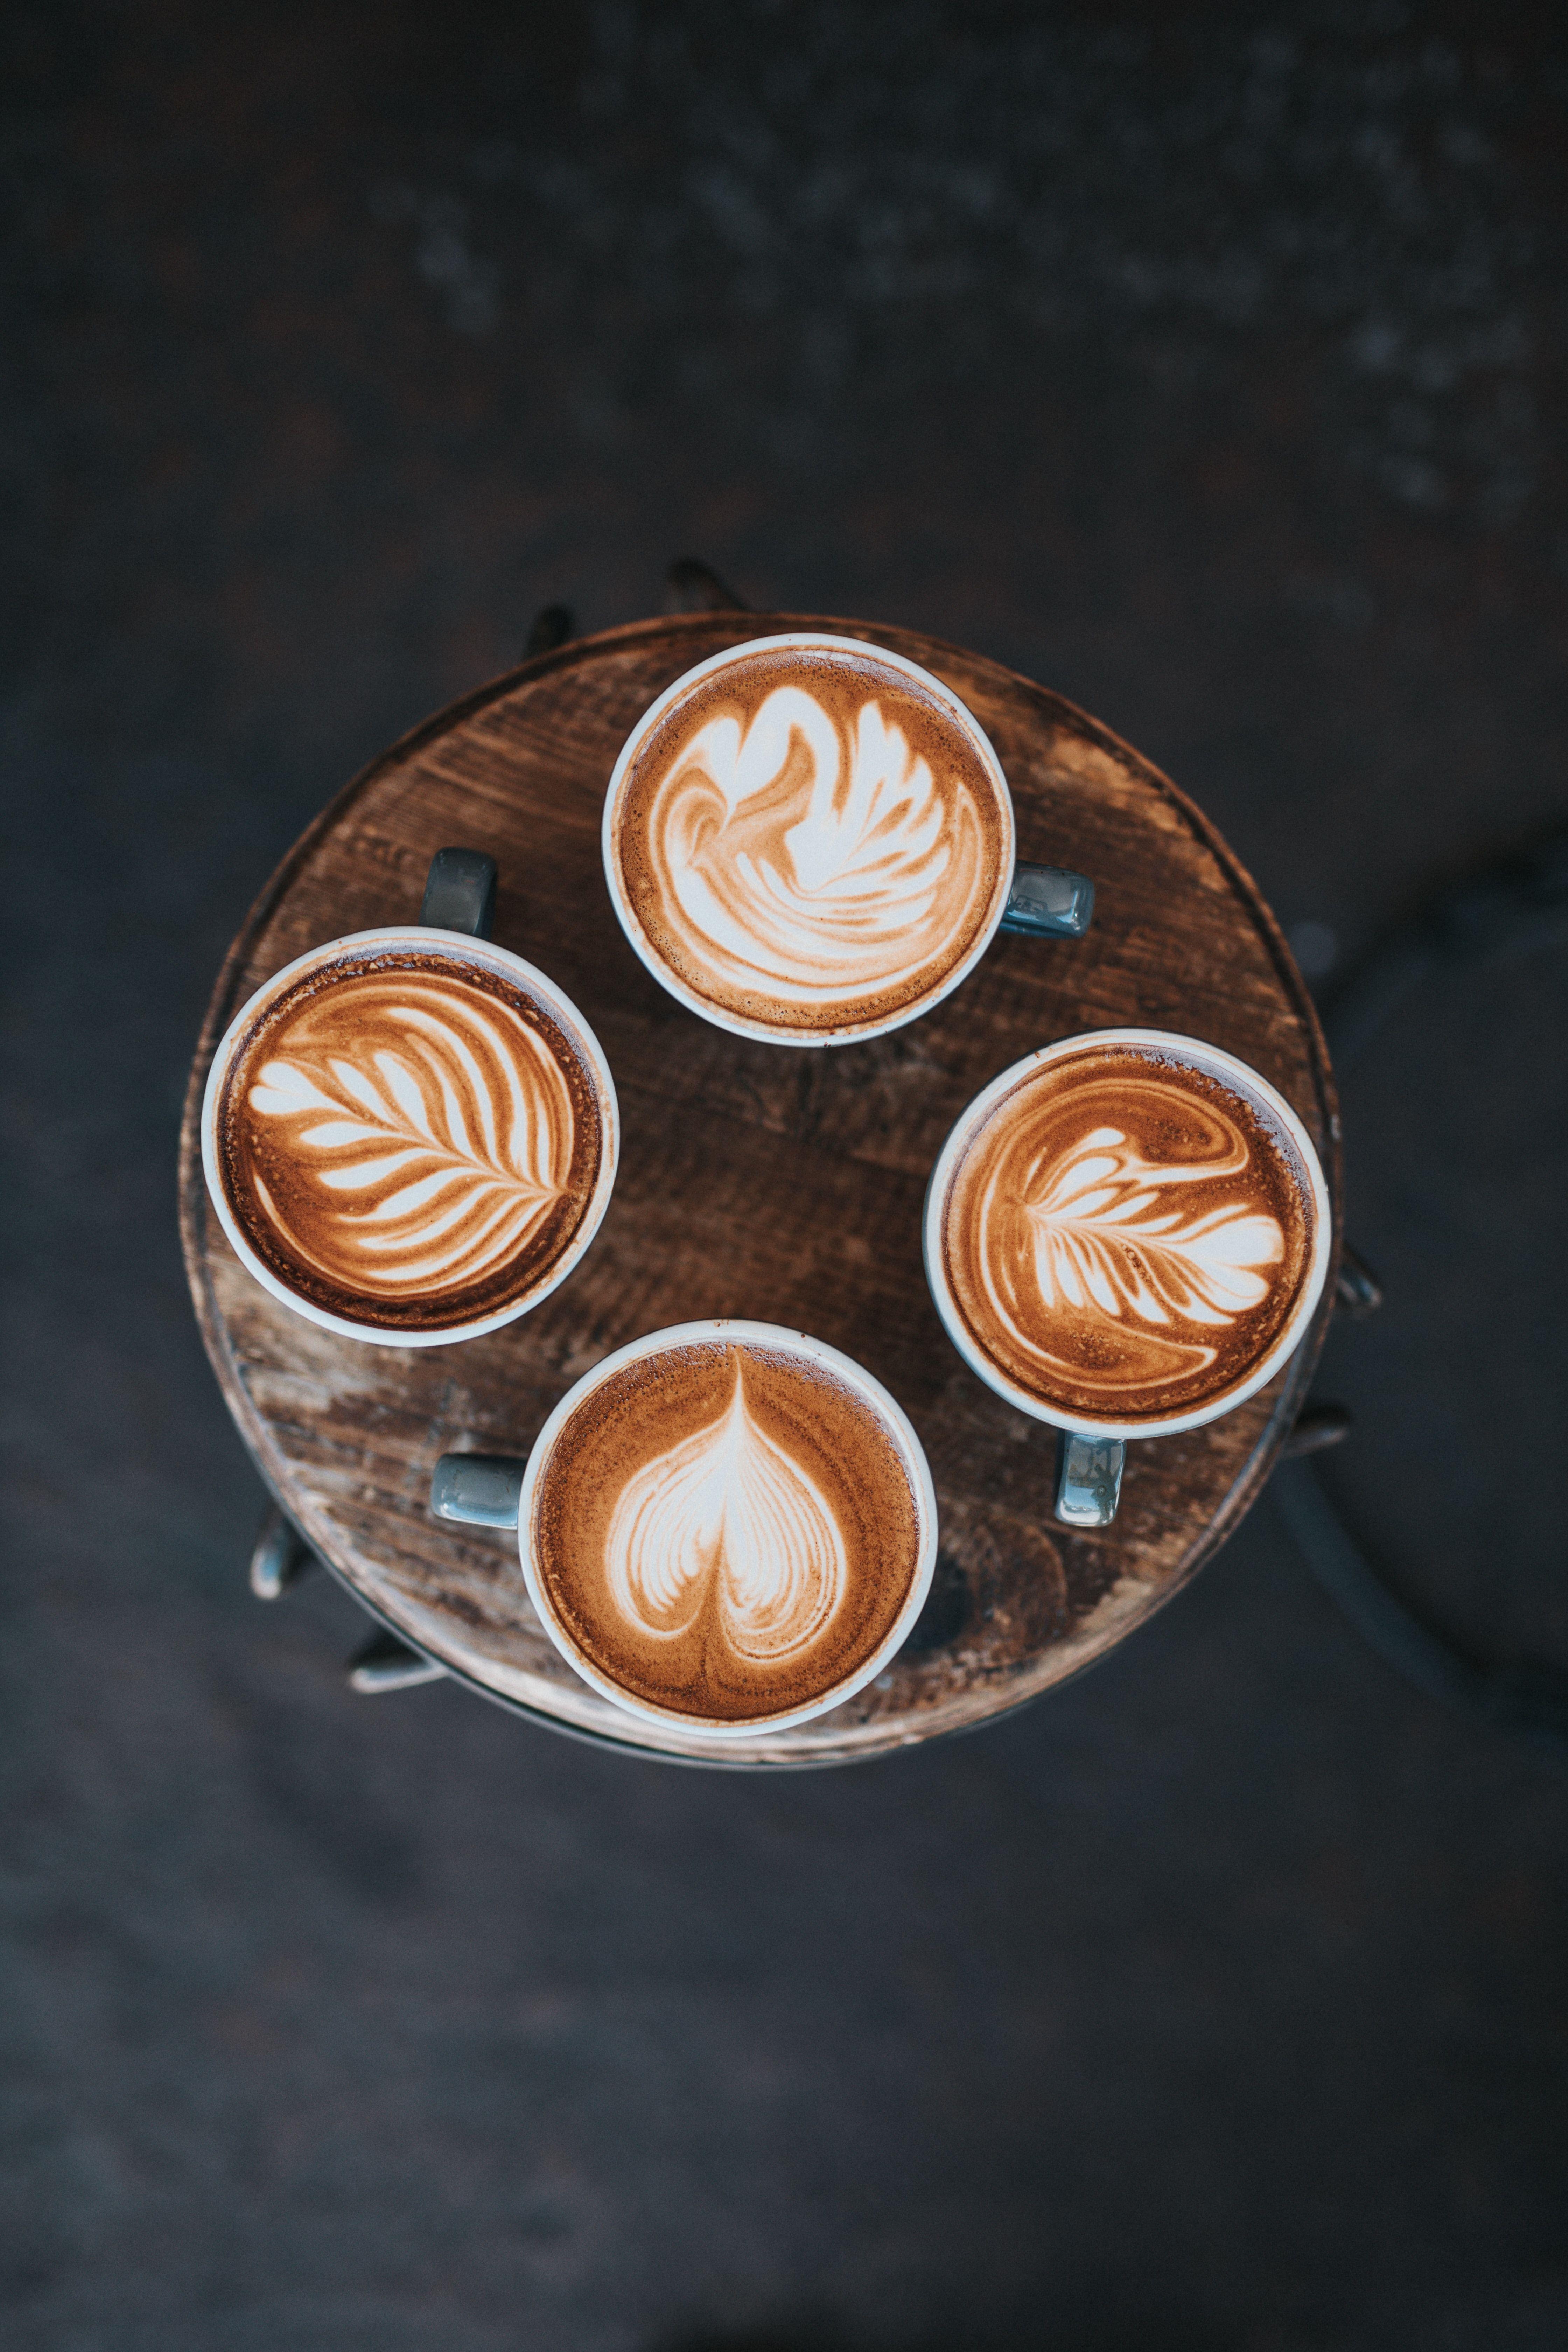 Latte_nathan-dumlao-iku3j1nr52w-unsplash